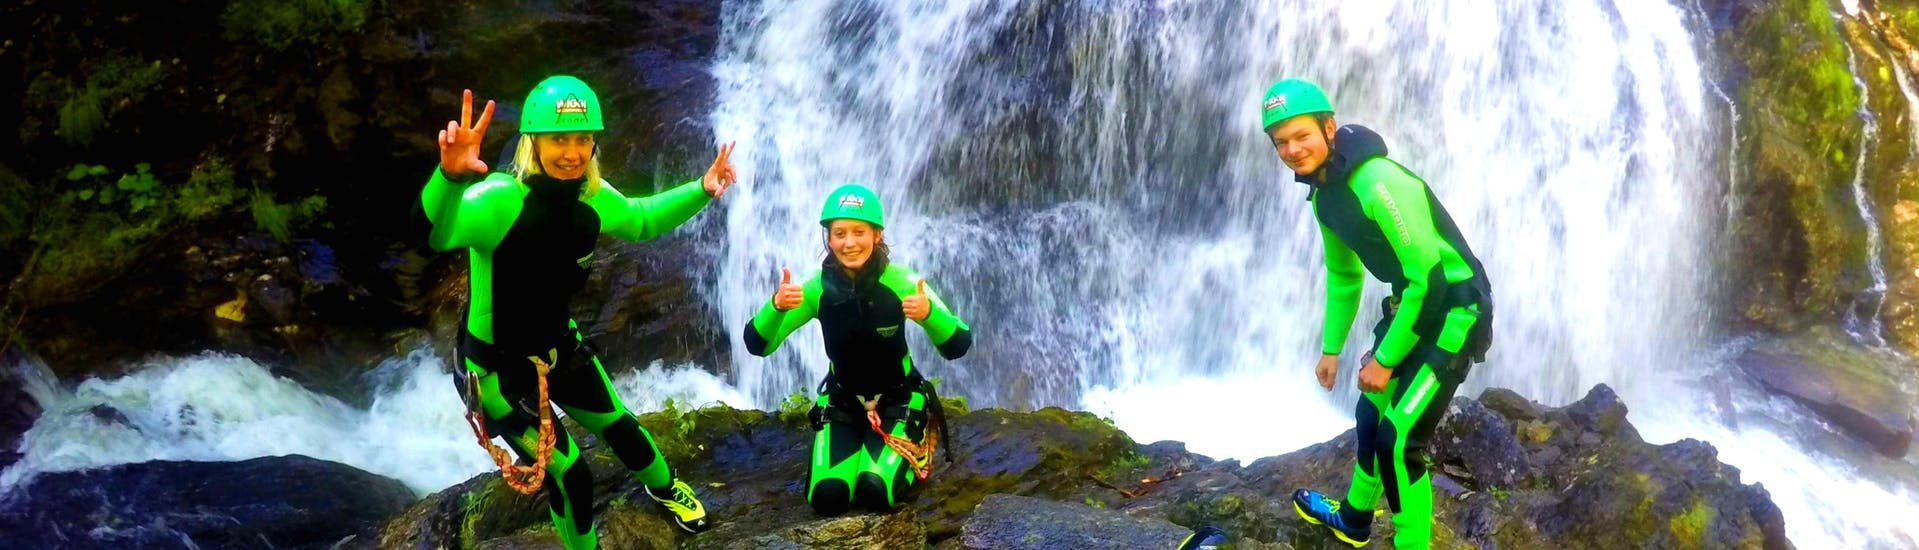 Canyoning for Beginners in the Alpenrosenklamm - Apache Tour